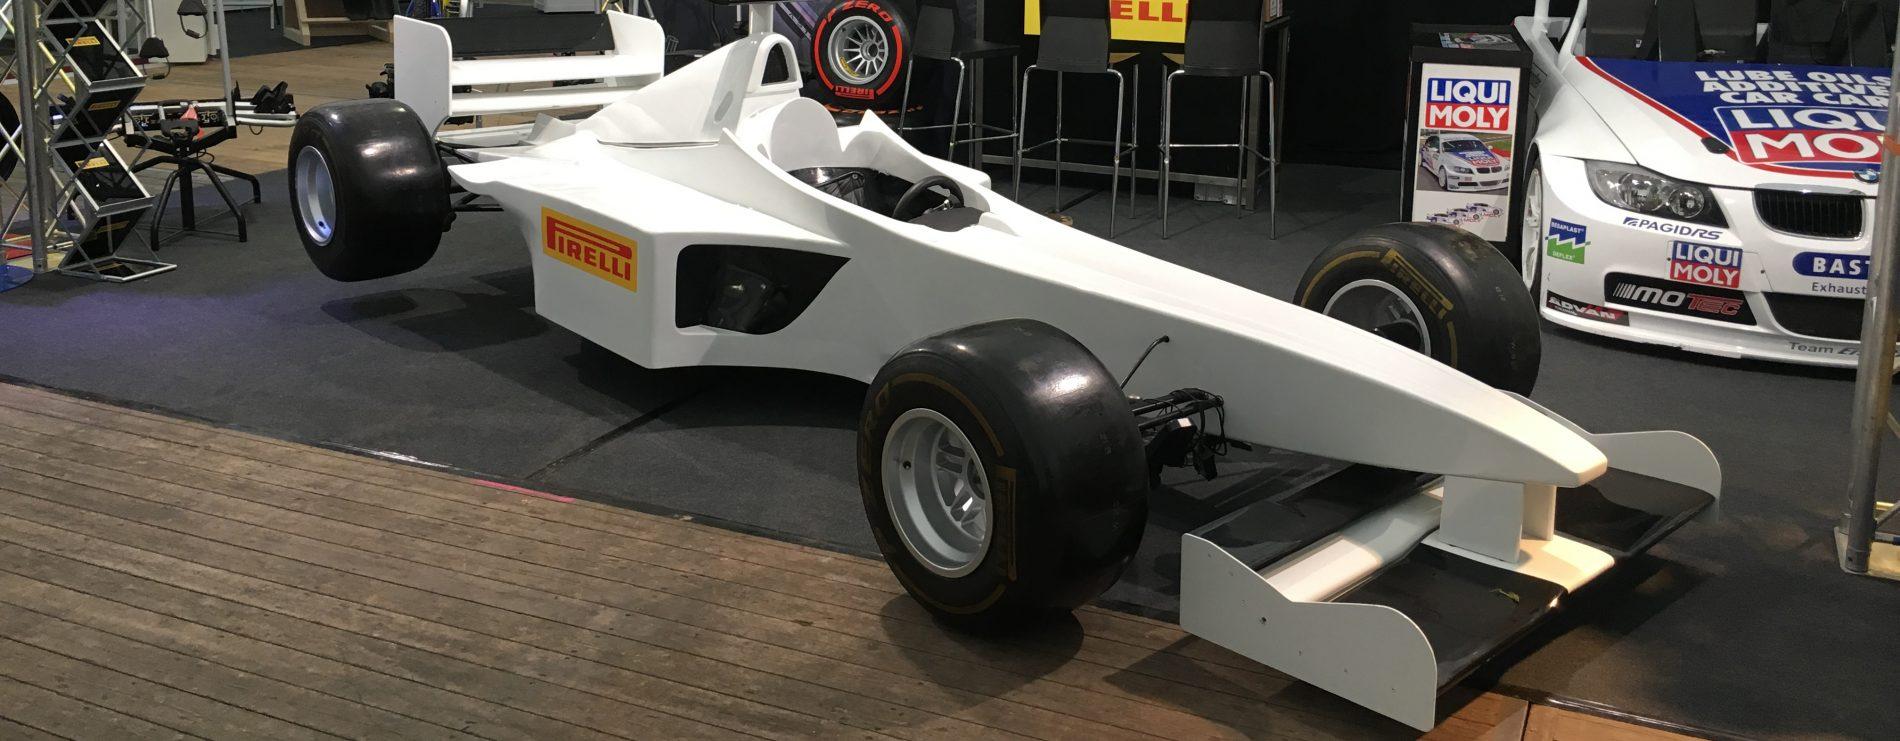 F1 Boxenstopp Simulation